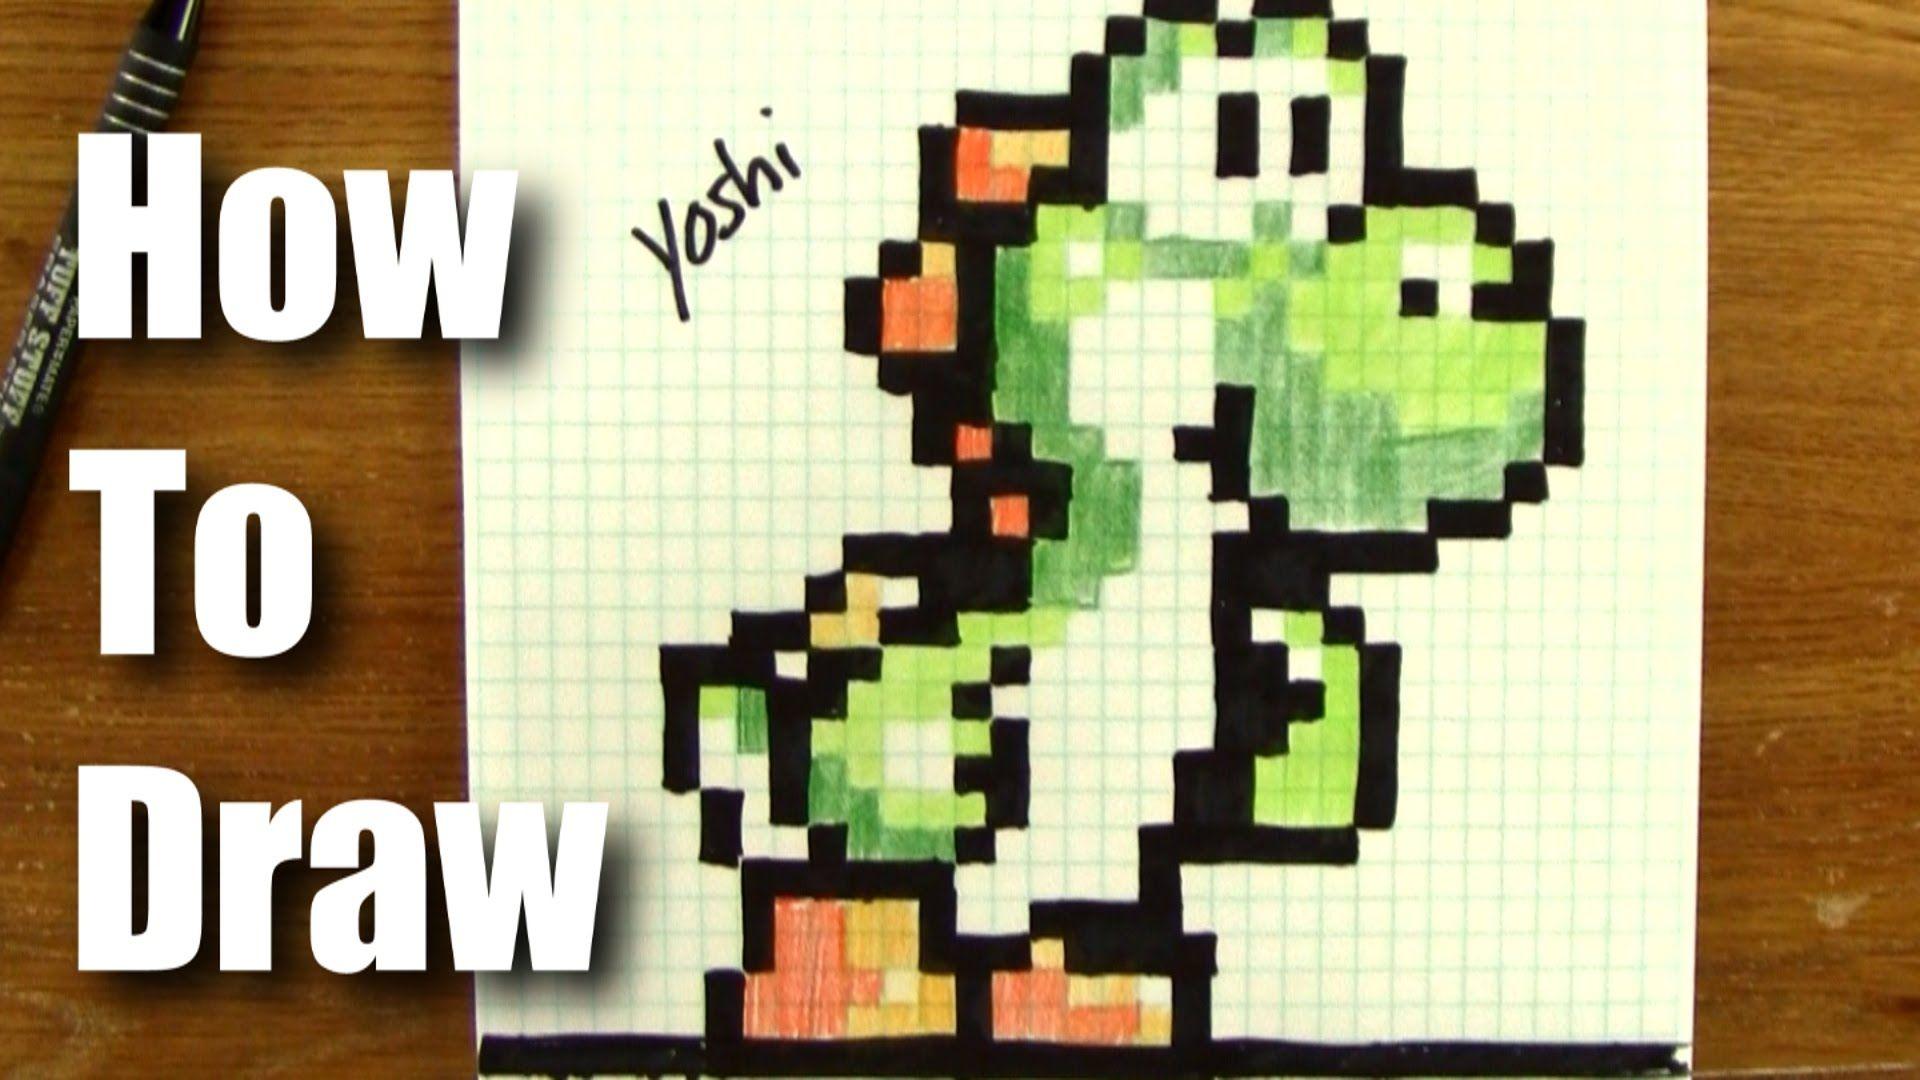 How To Draw 8 Bit Yoshi From Mario! | 8-bit drawing | Yoshi drawing